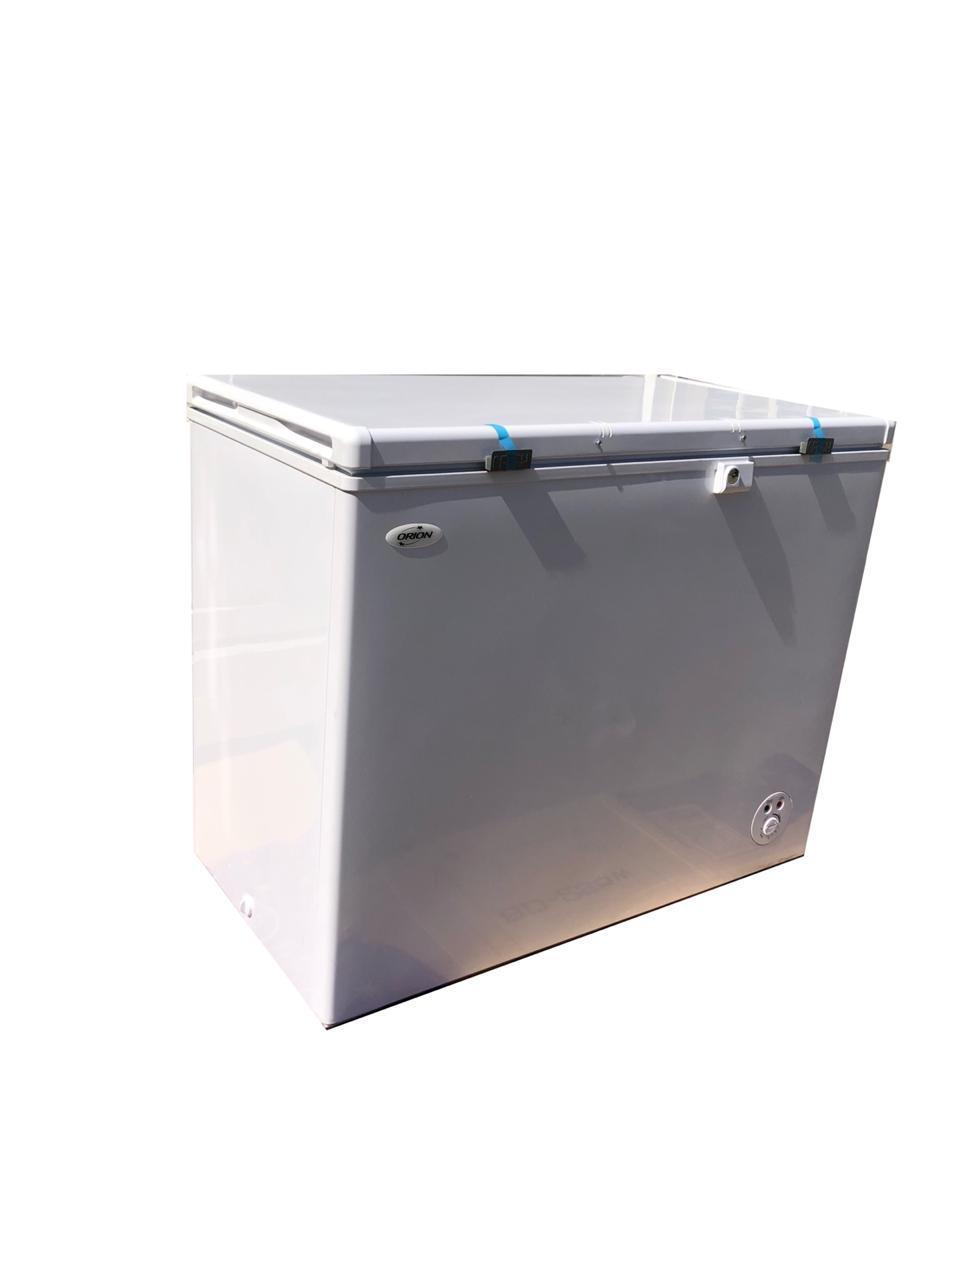 Холодильник-морозильник  ORION  BD-235W сундук (белый)